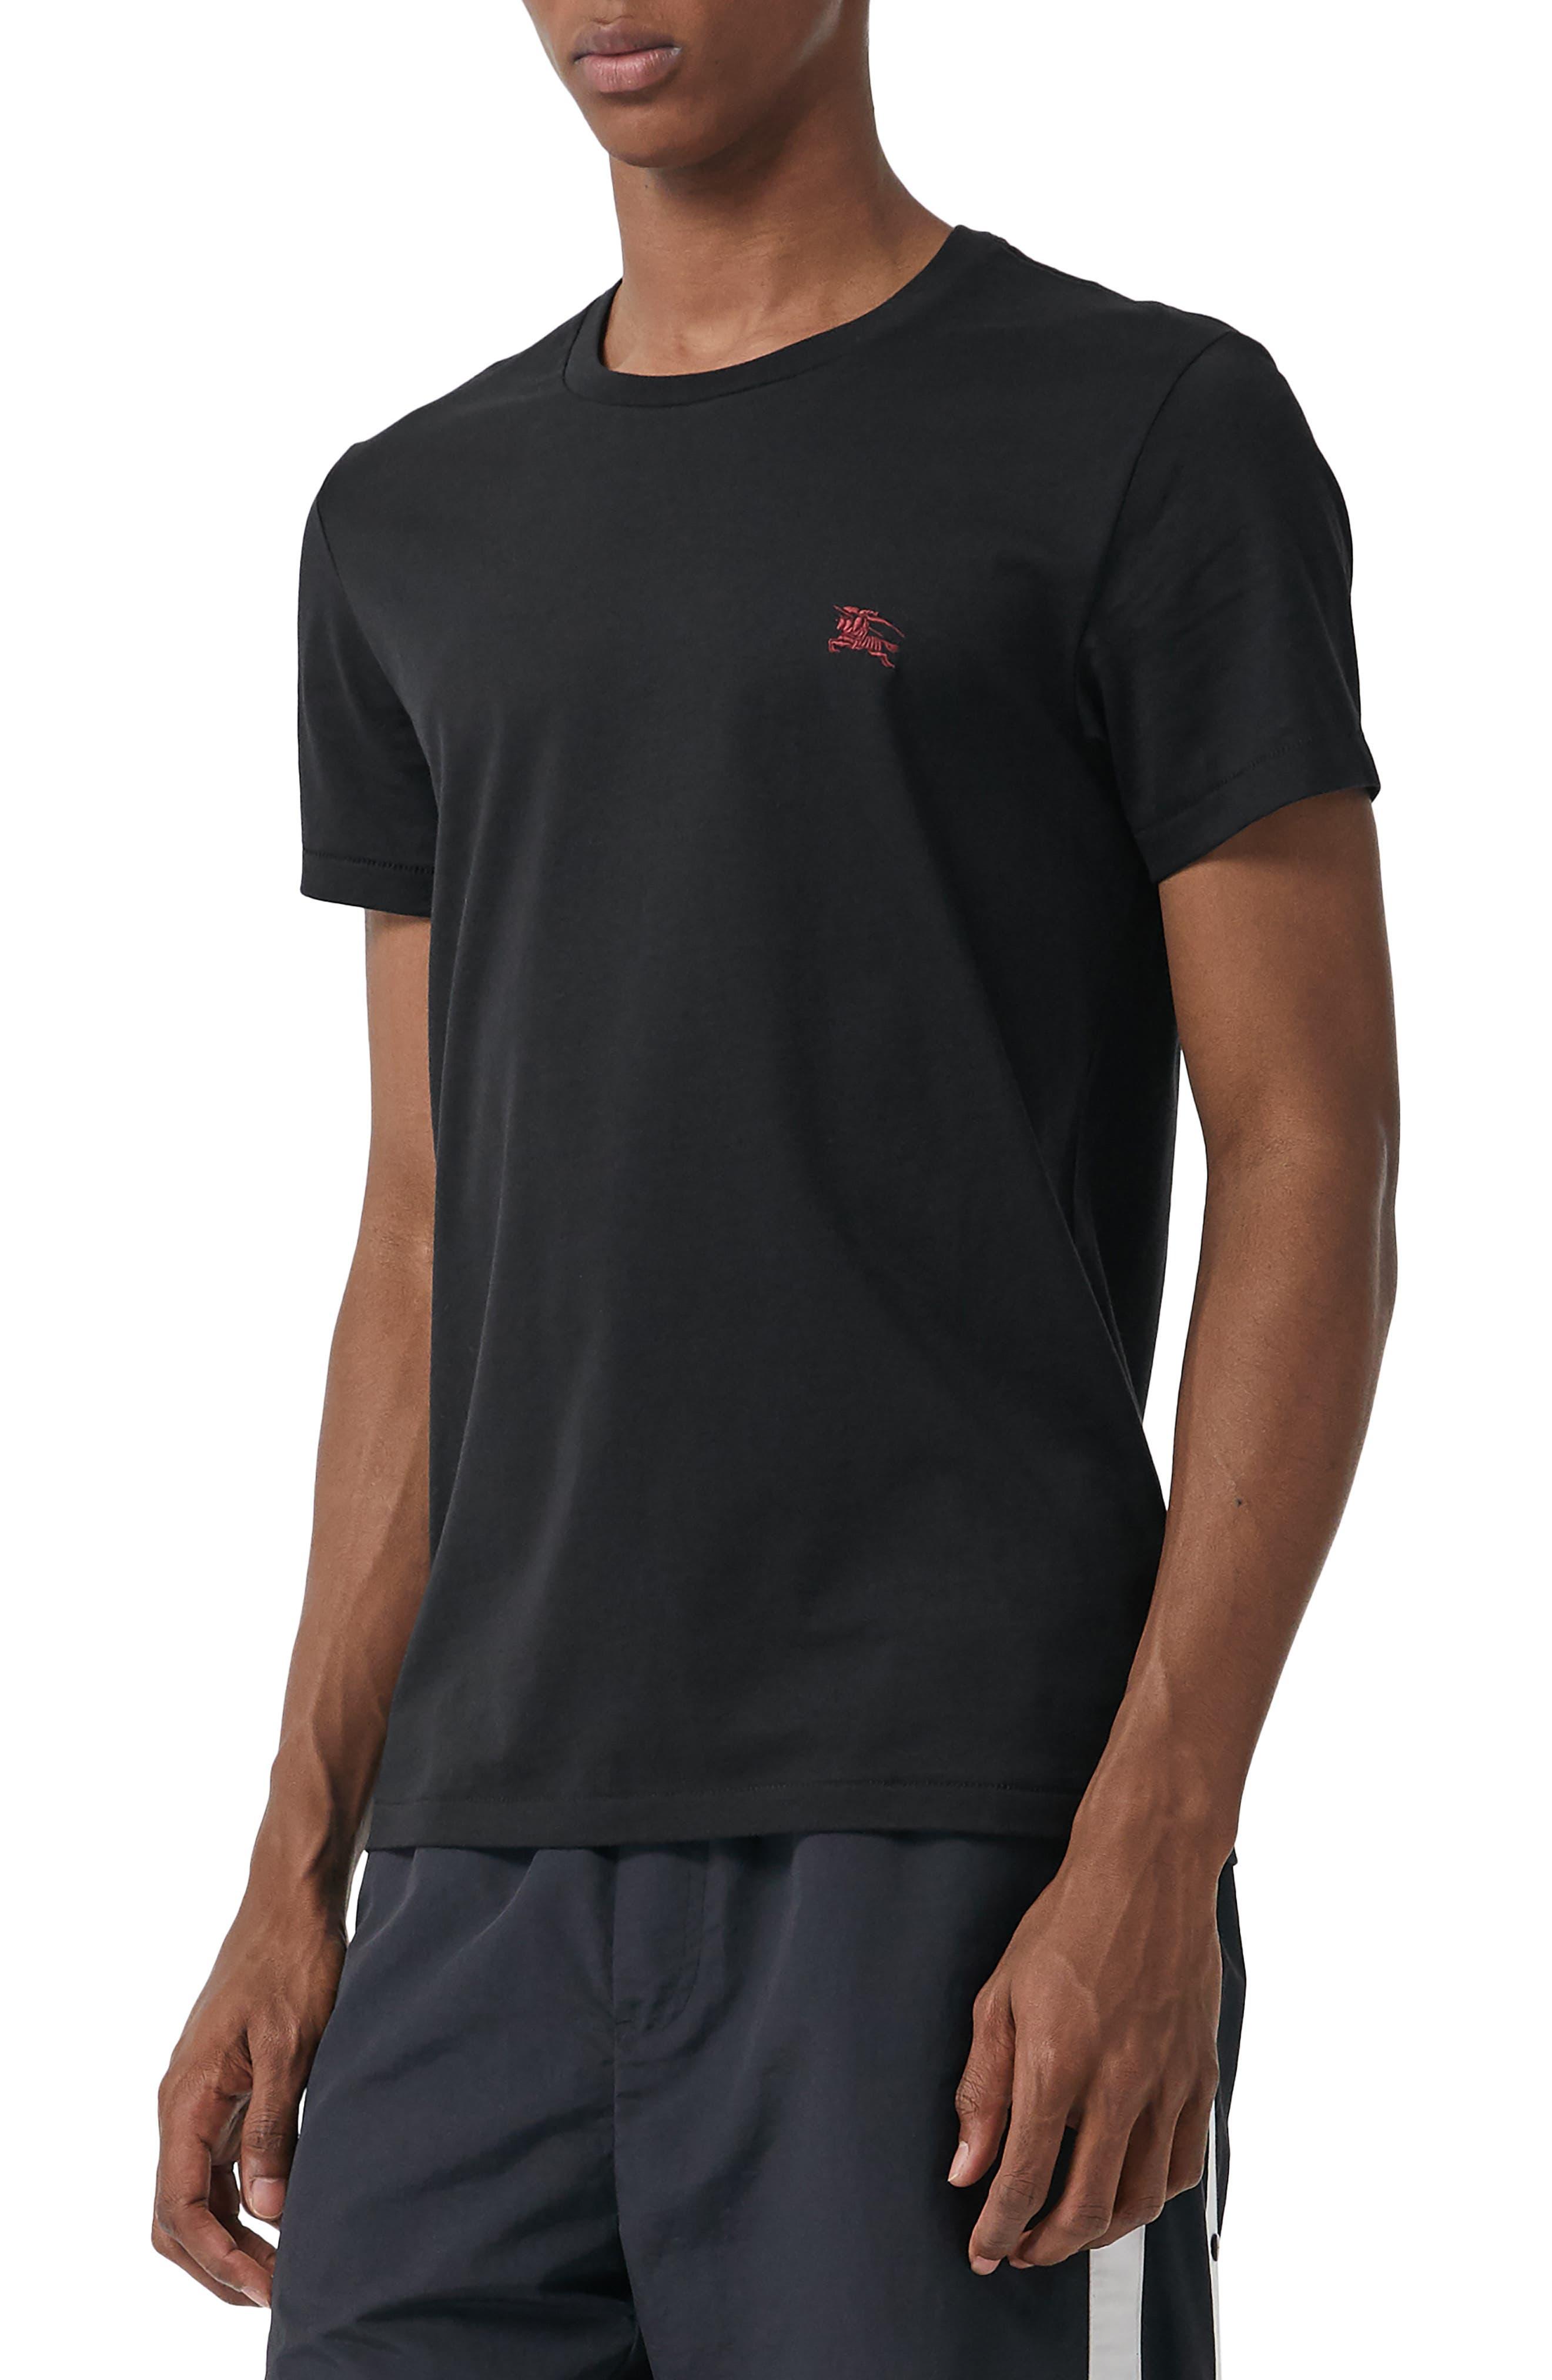 BURBERRY, Logo Embroidered Crewneck T-shirt, Main thumbnail 1, color, TRUE BLACK